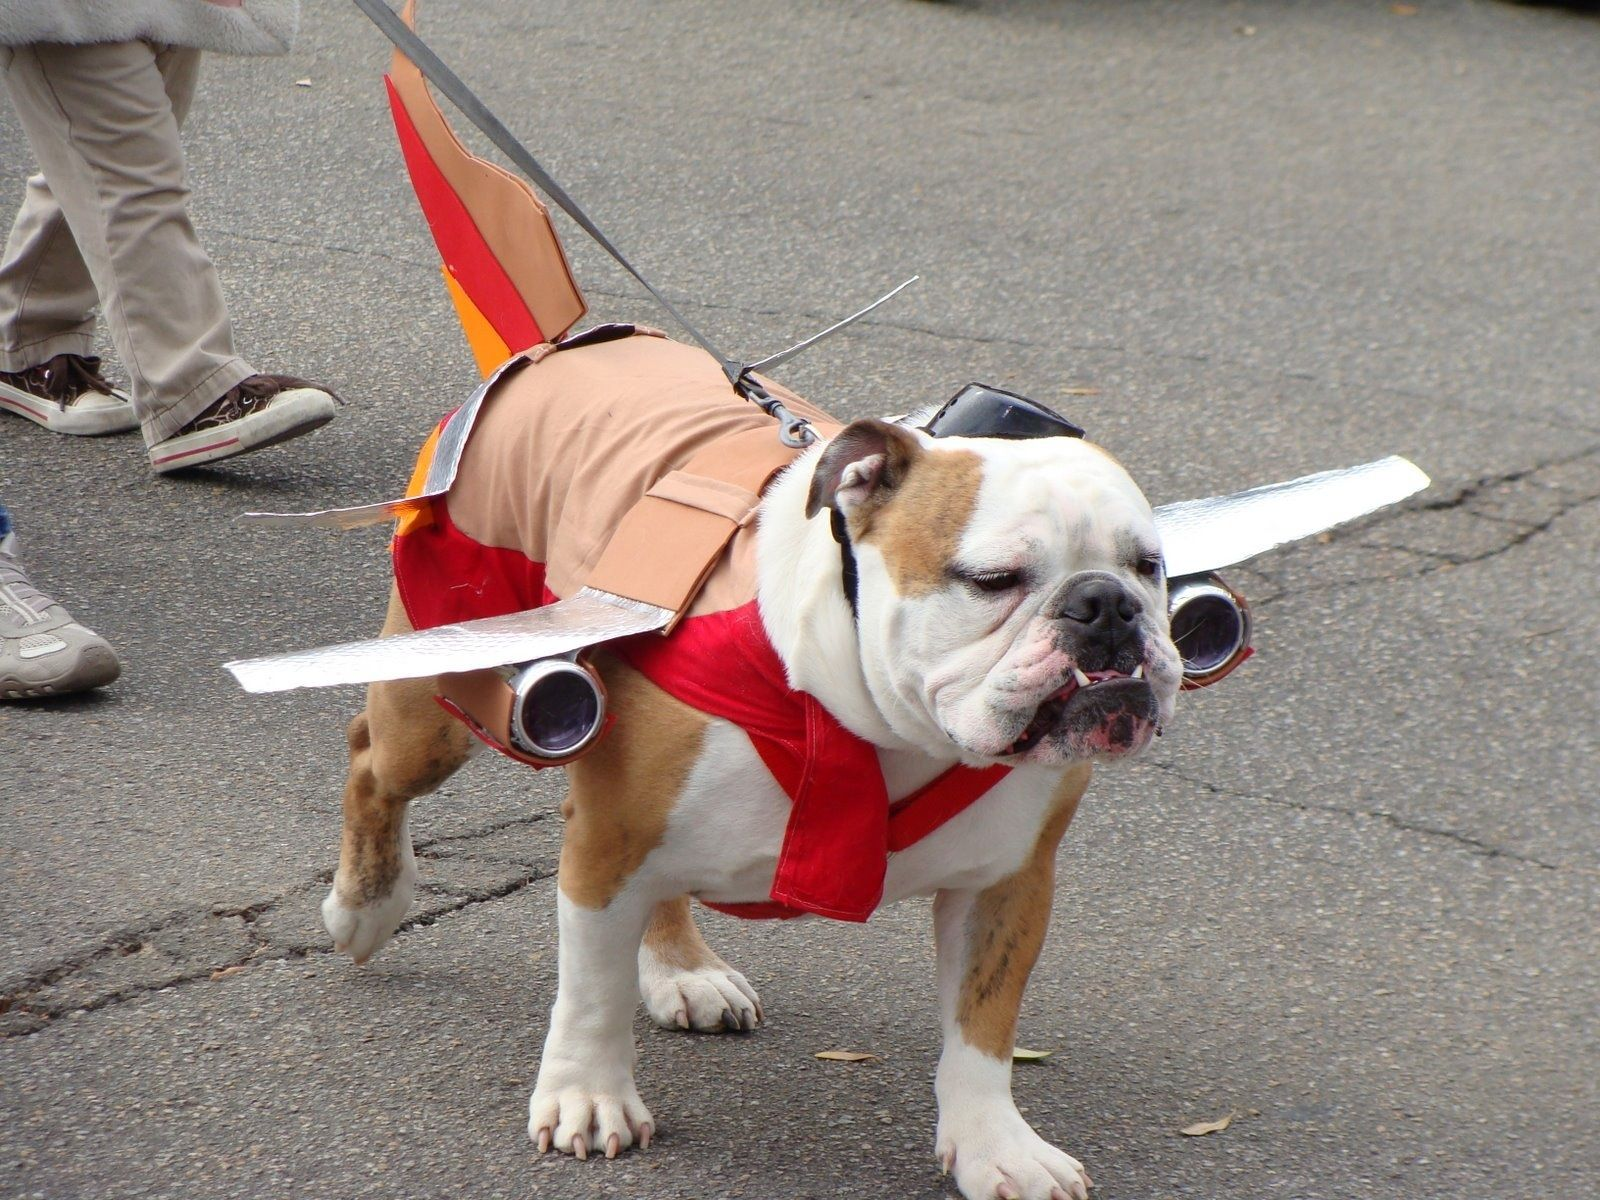 Southwest Airplane Costume Funny Dog Pictures Bulldog Bulldog